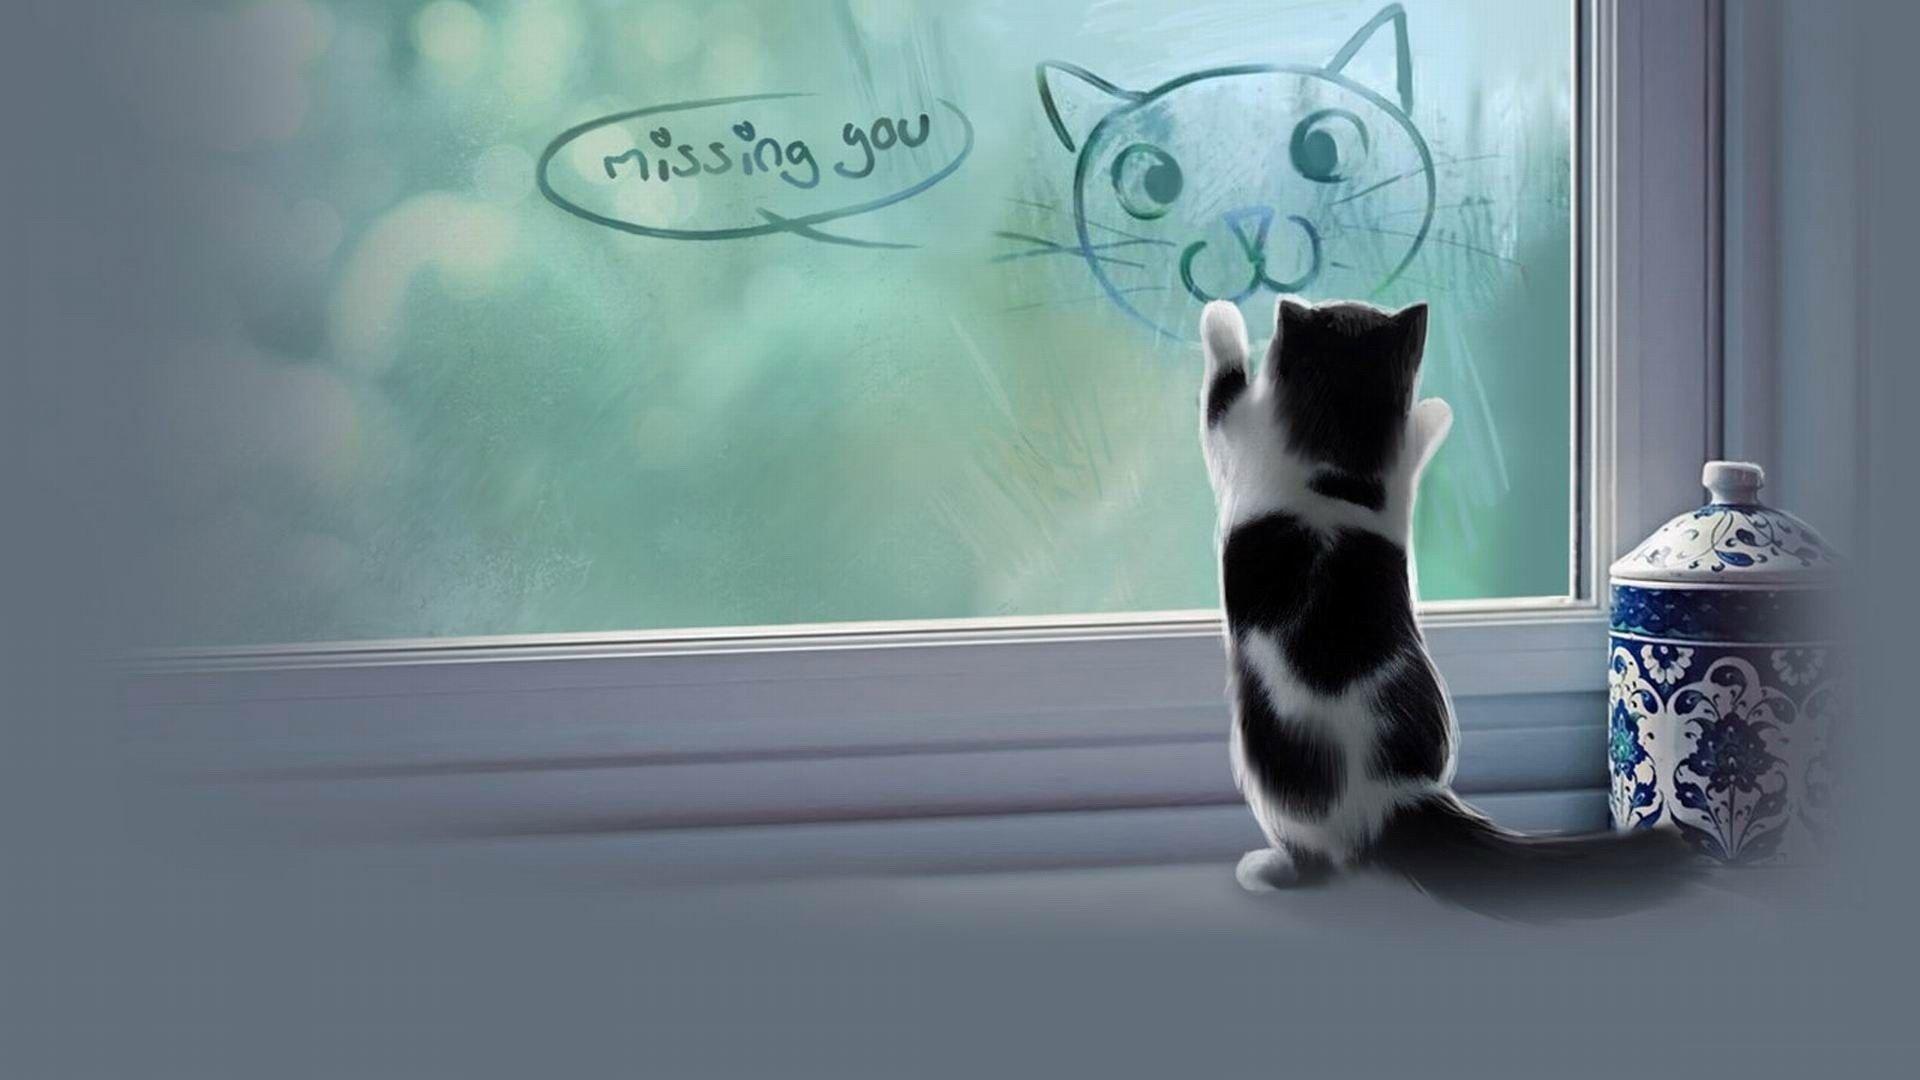 Cat meme quote funny humor grumpy kitten sad love mood wallpaper  1920x1080 ...